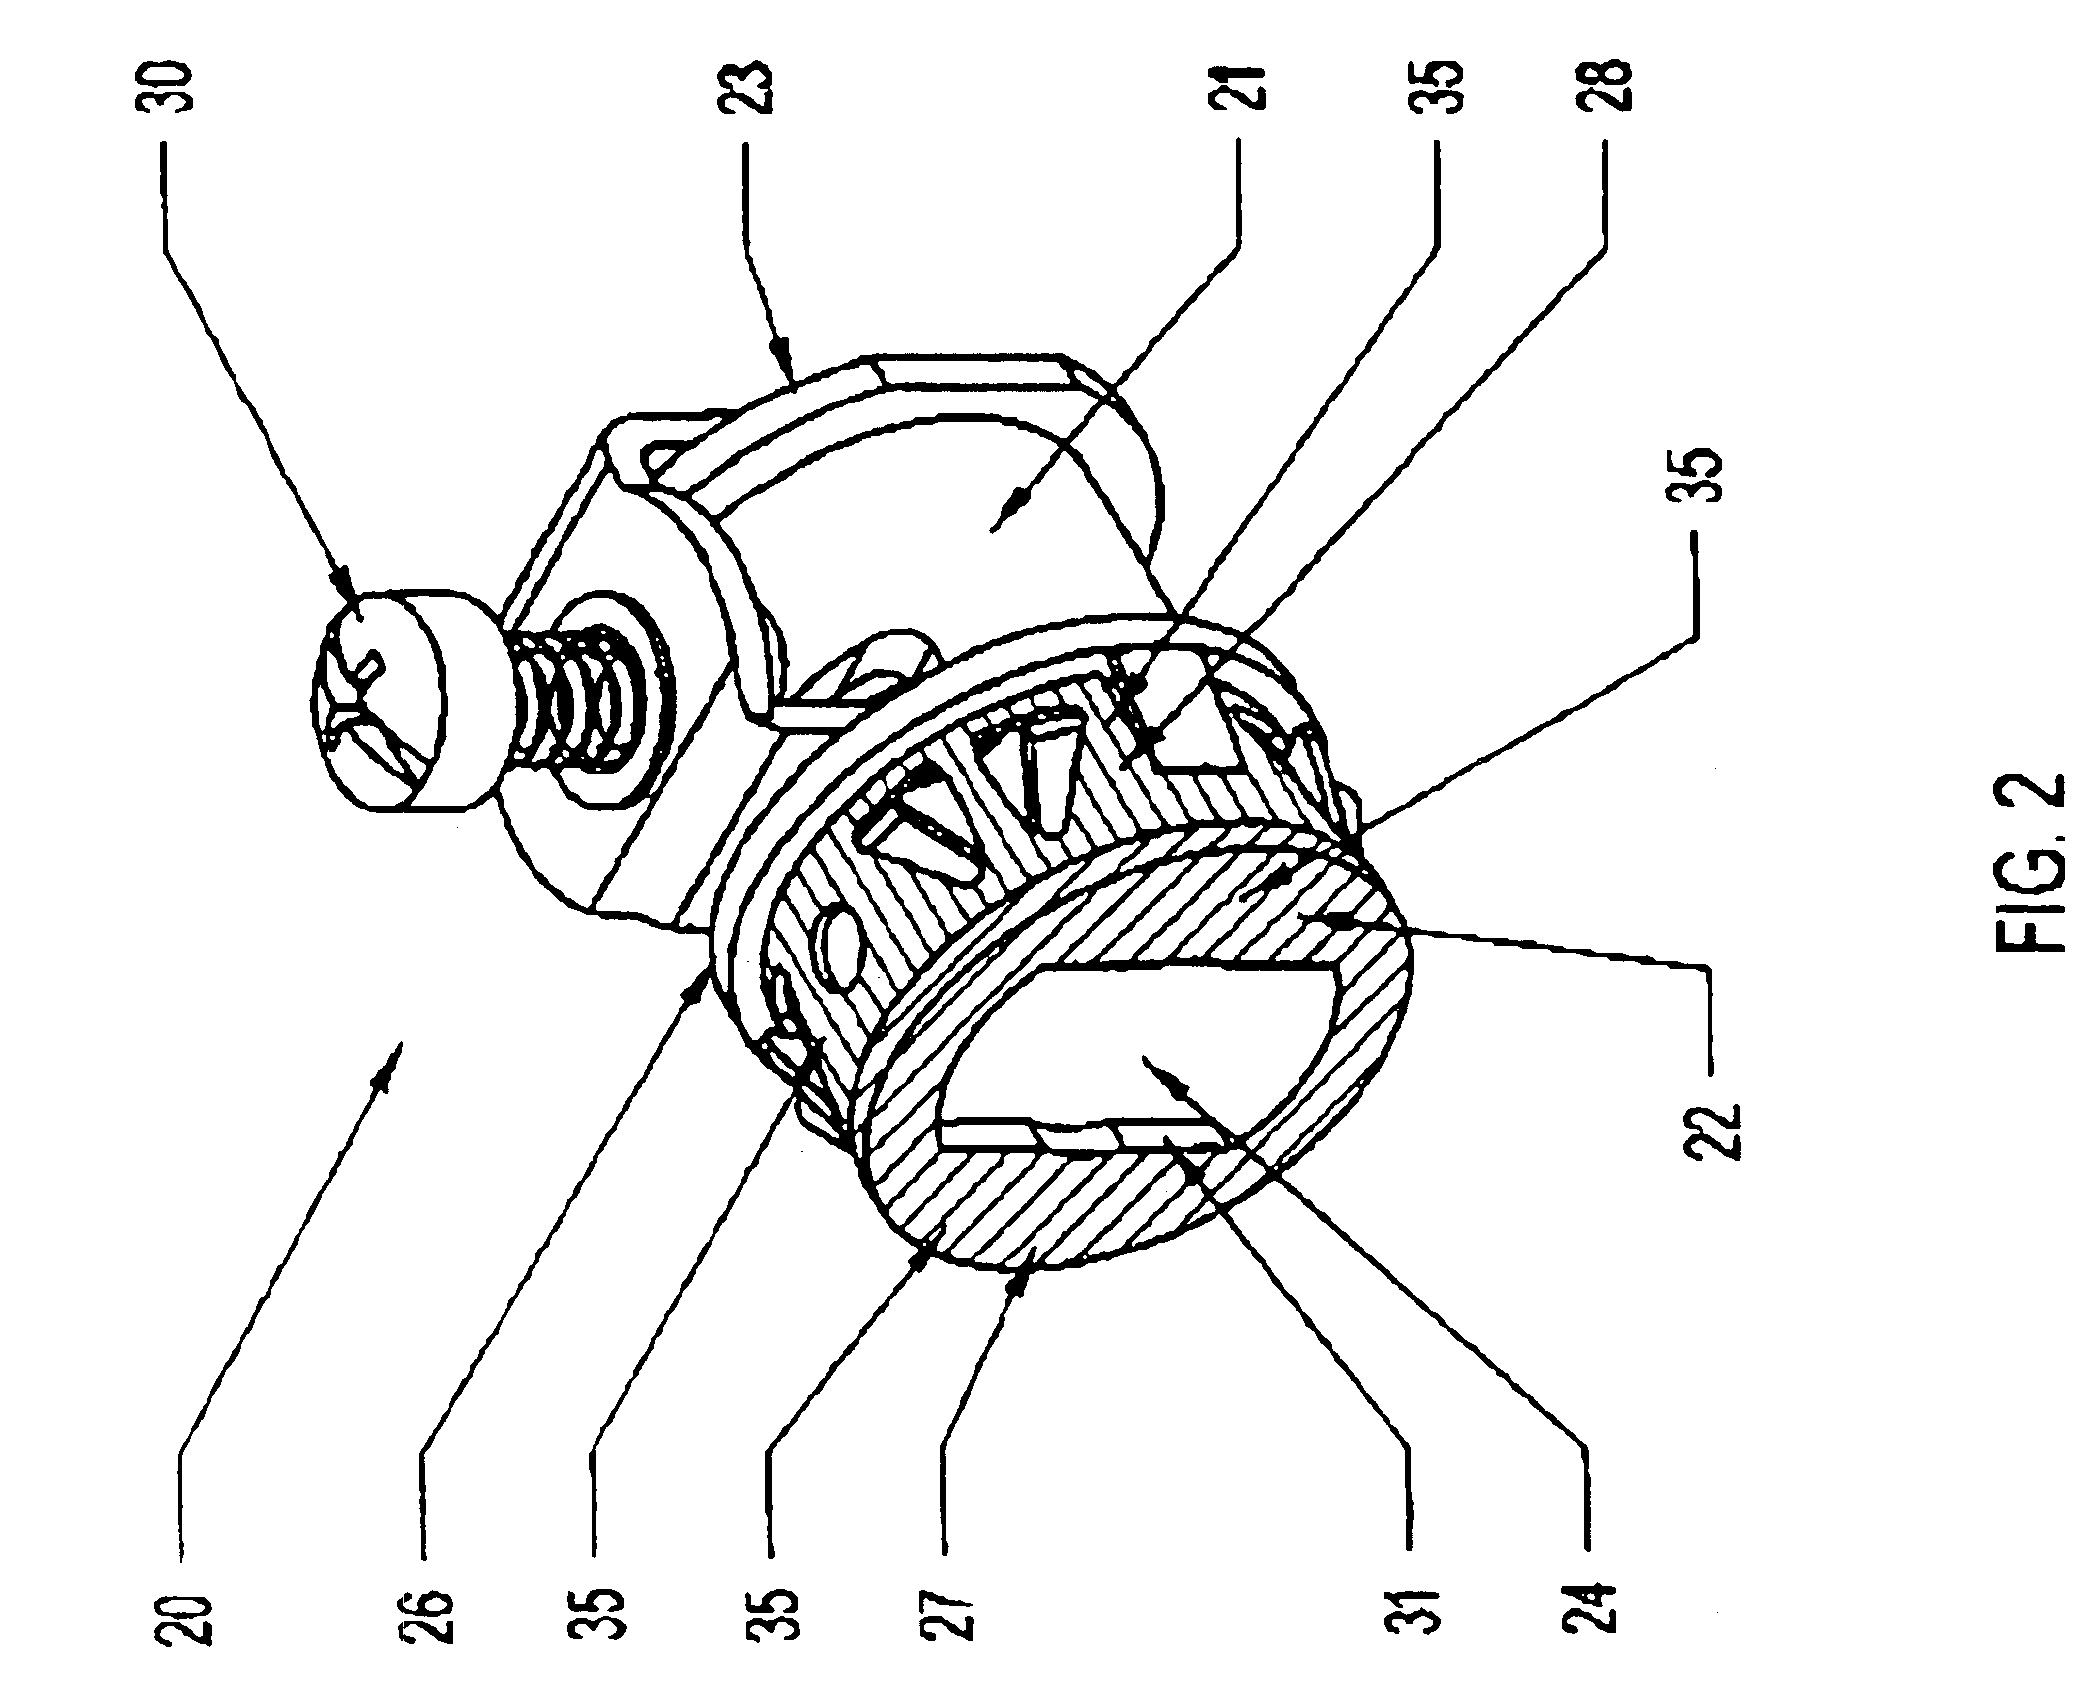 US06861585 20050301 D00002 three phase plug wiring diagram,phase wiring diagram images database,Three Outlet Wiring Diagram